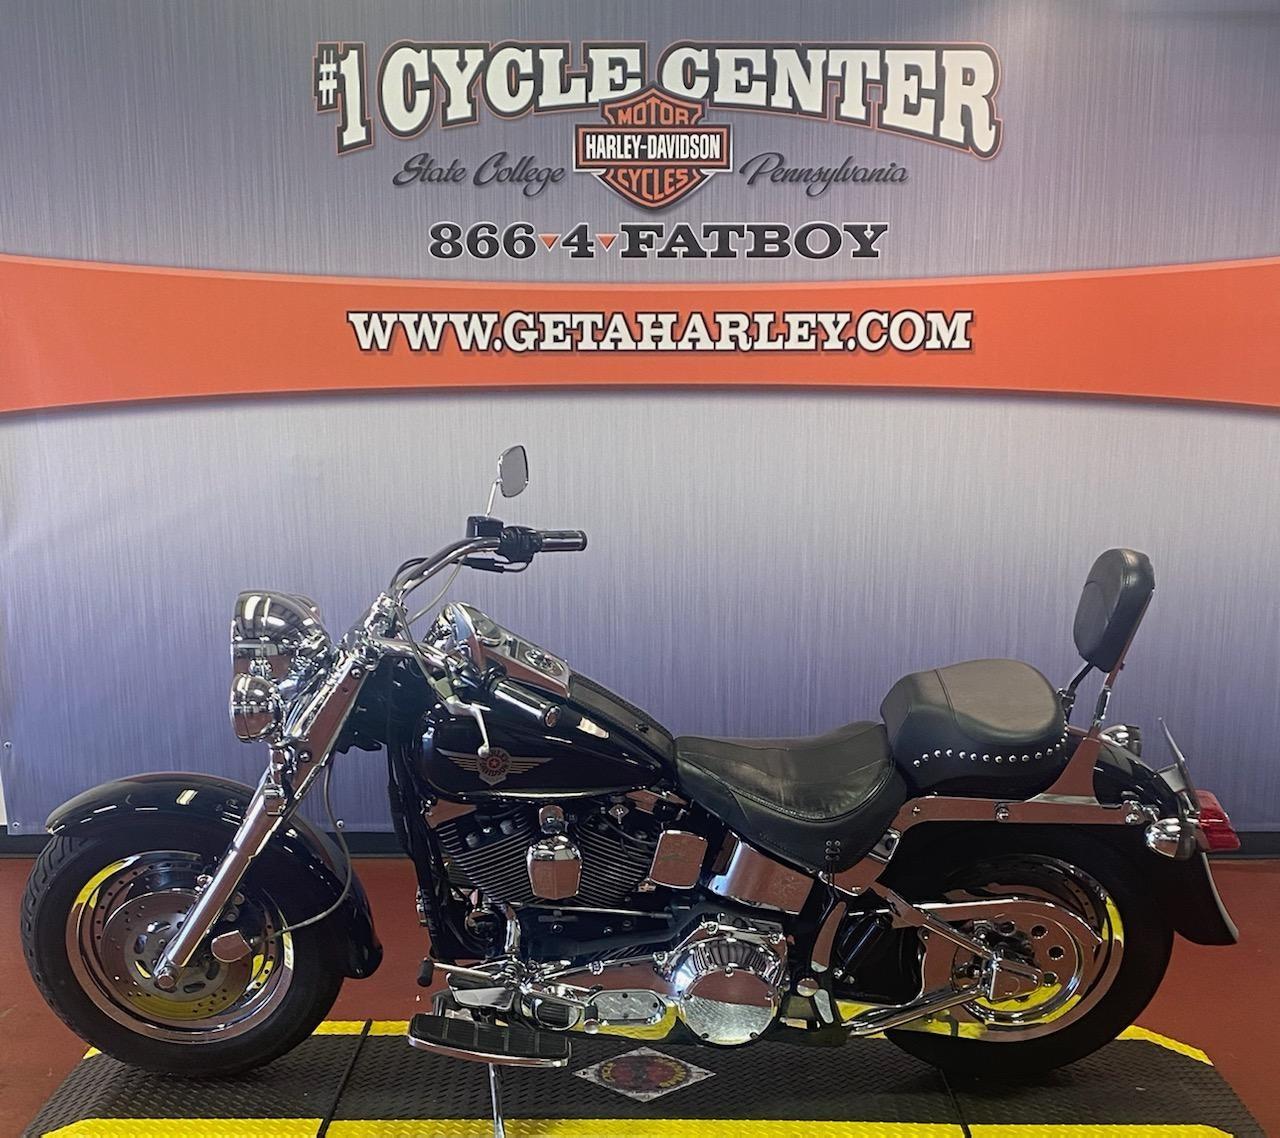 1999 Harley-Davidson FLSTF at #1 Cycle Center Harley-Davidson